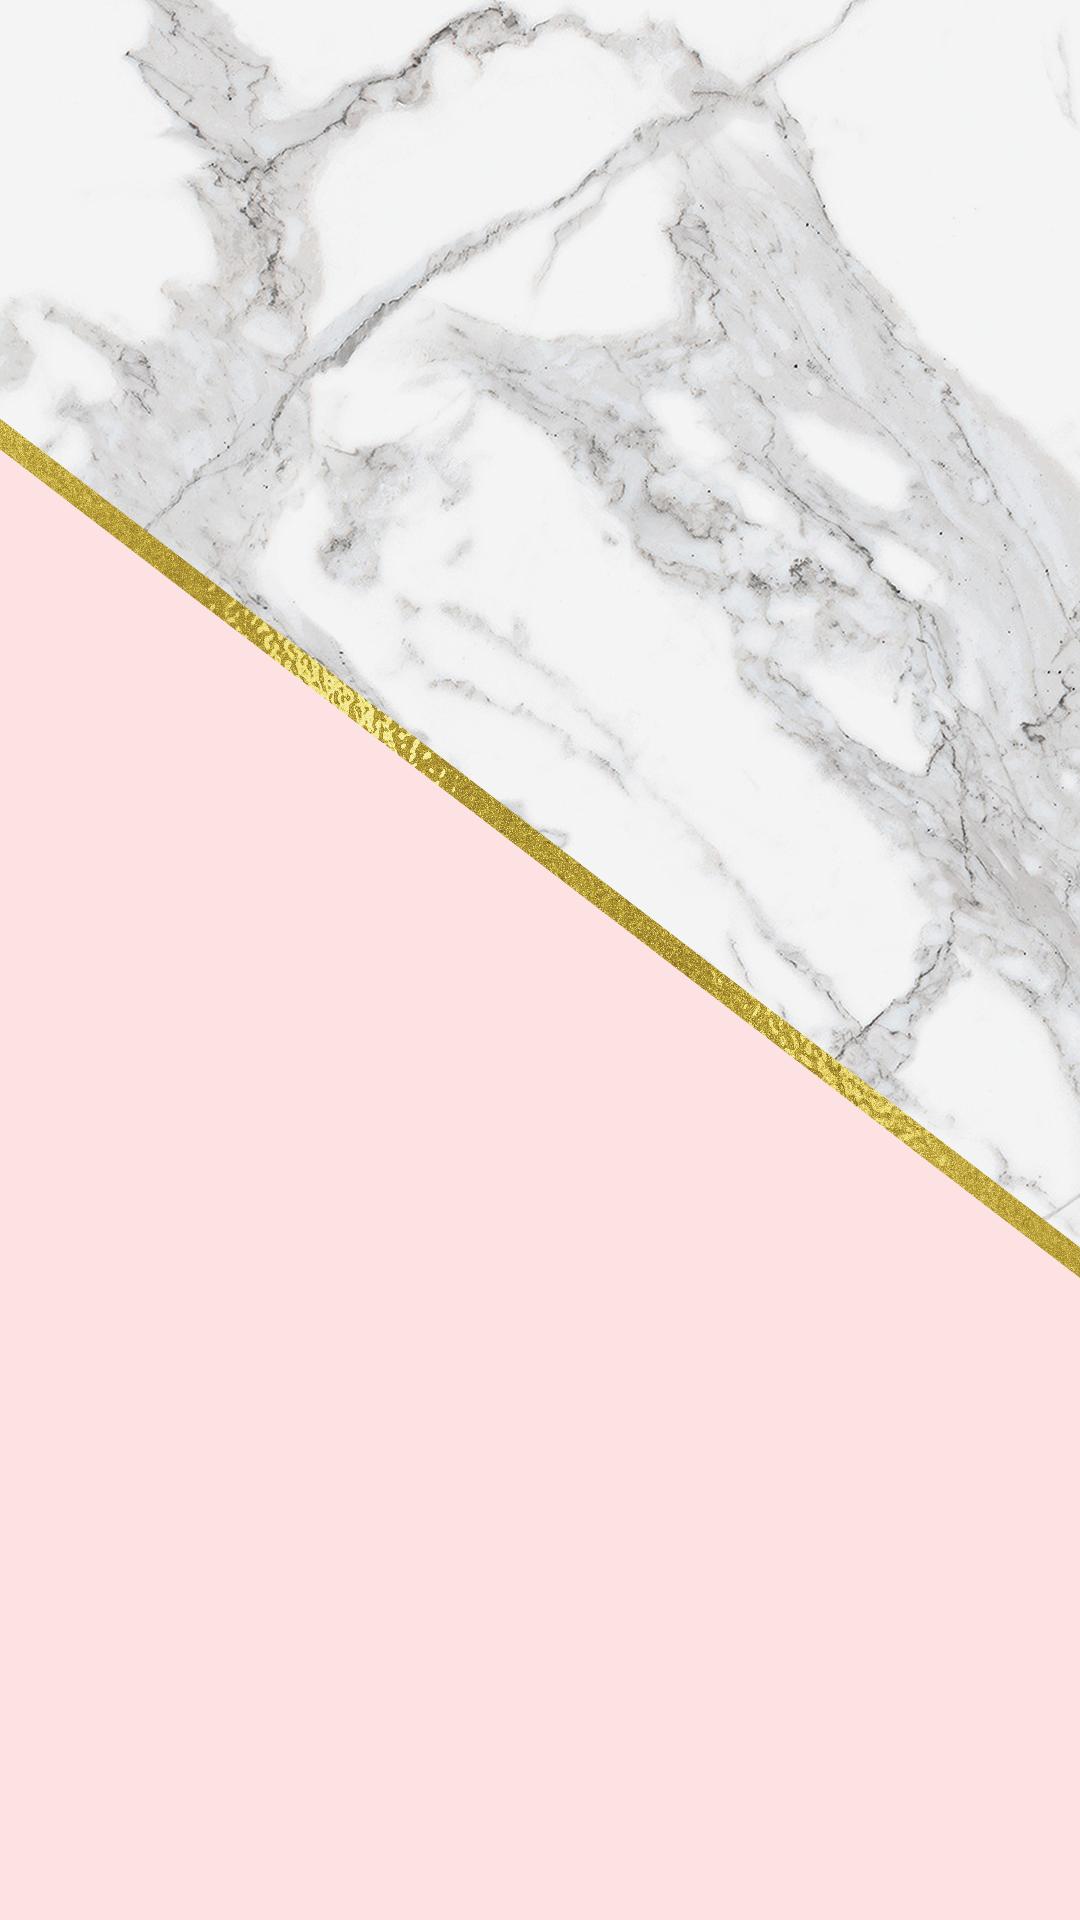 Marble Blush Phone Background Chicfetti